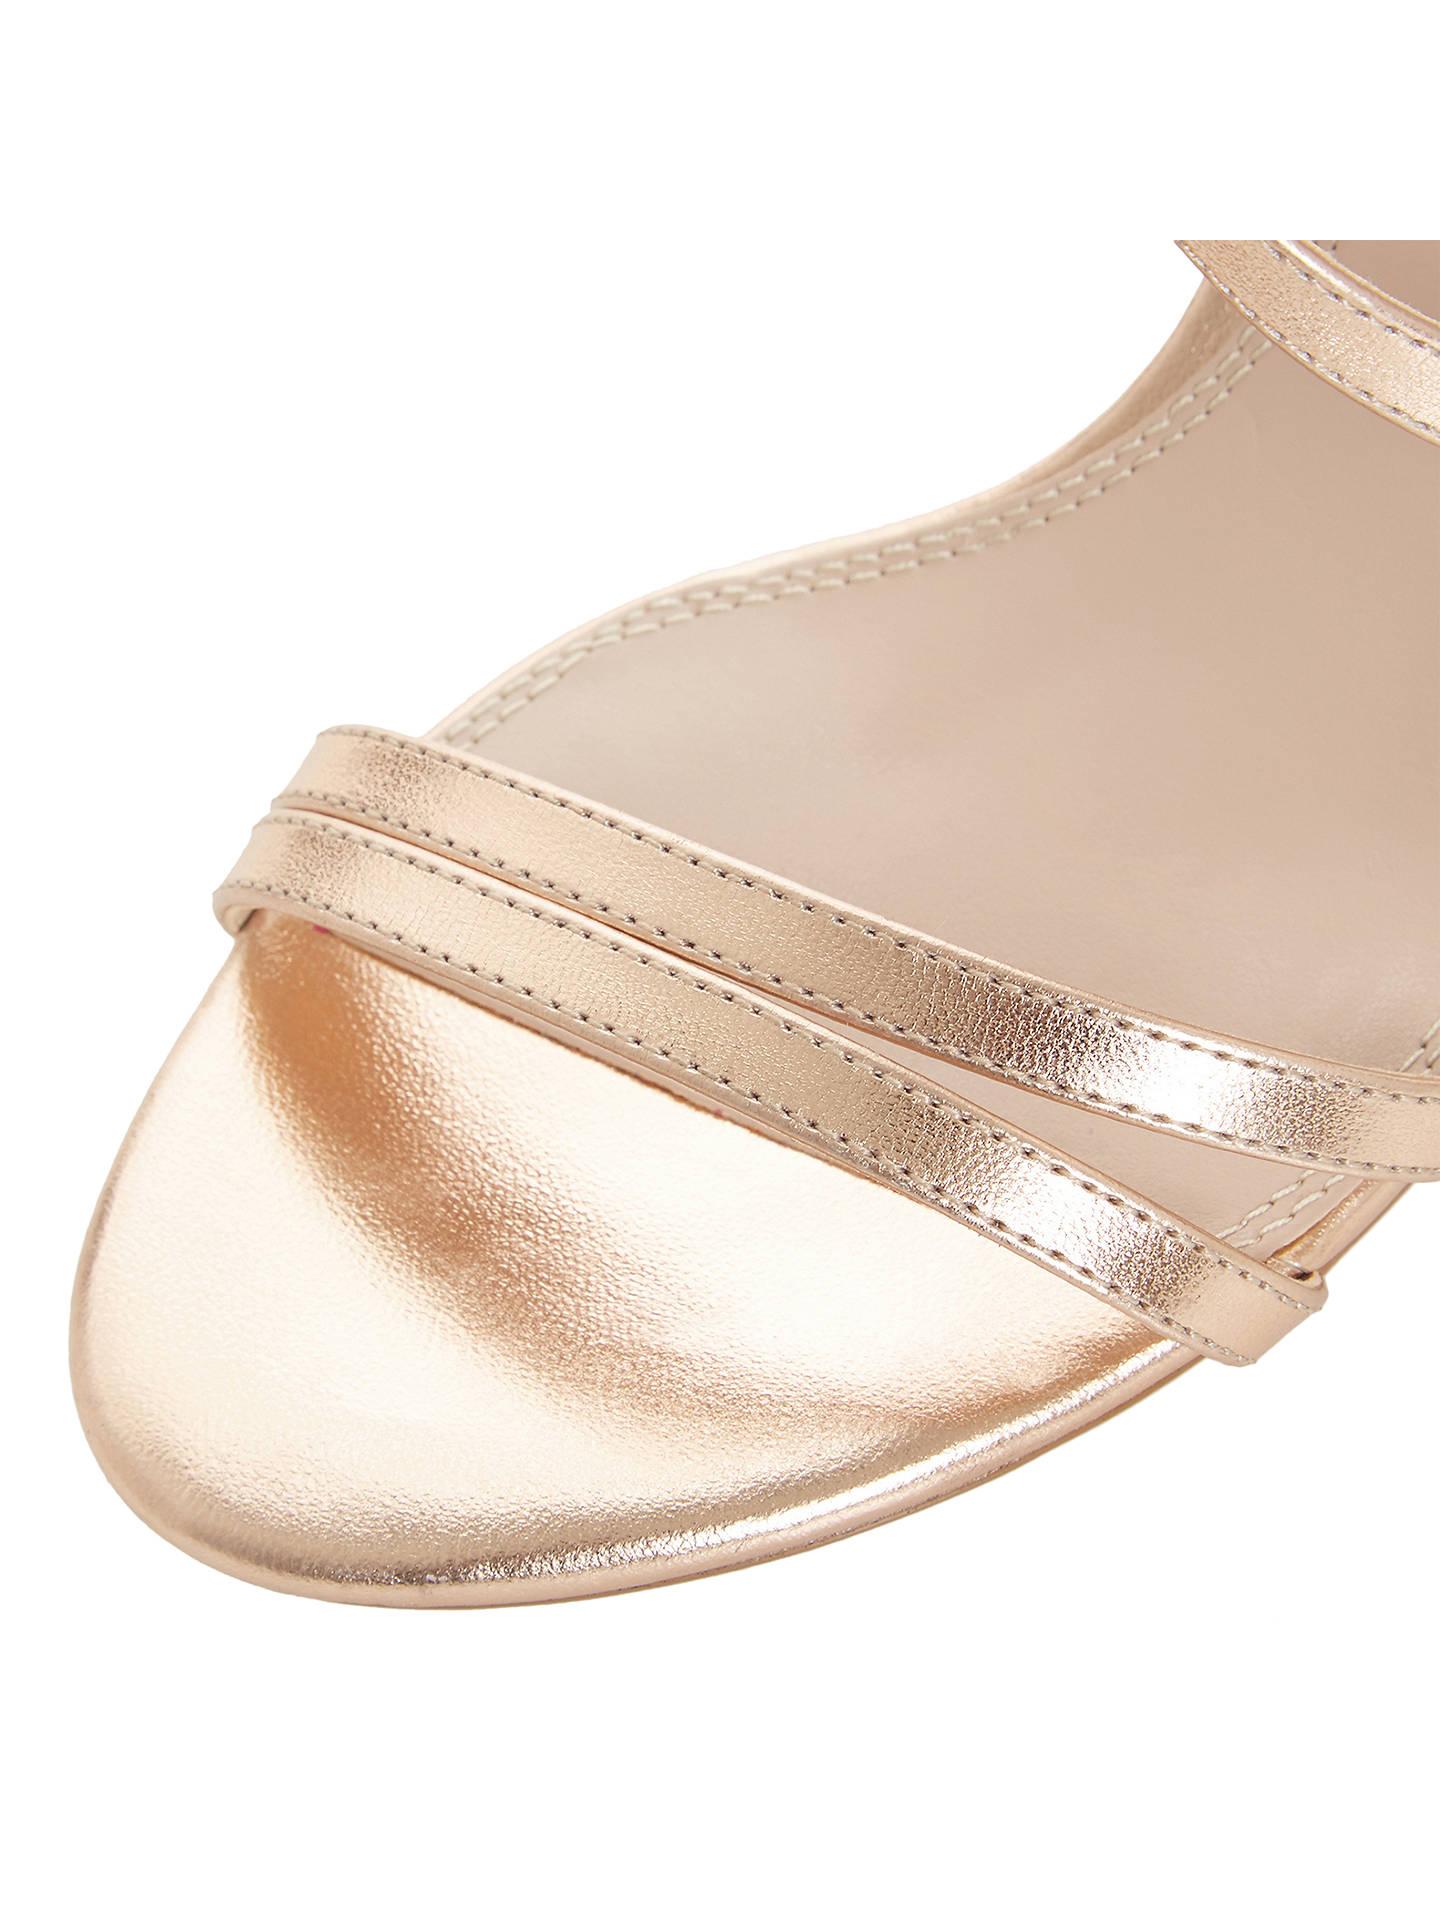 cb6ff7d35 ... Buy Dune Mariela Cross Strap Stiletto Heeled Sandals